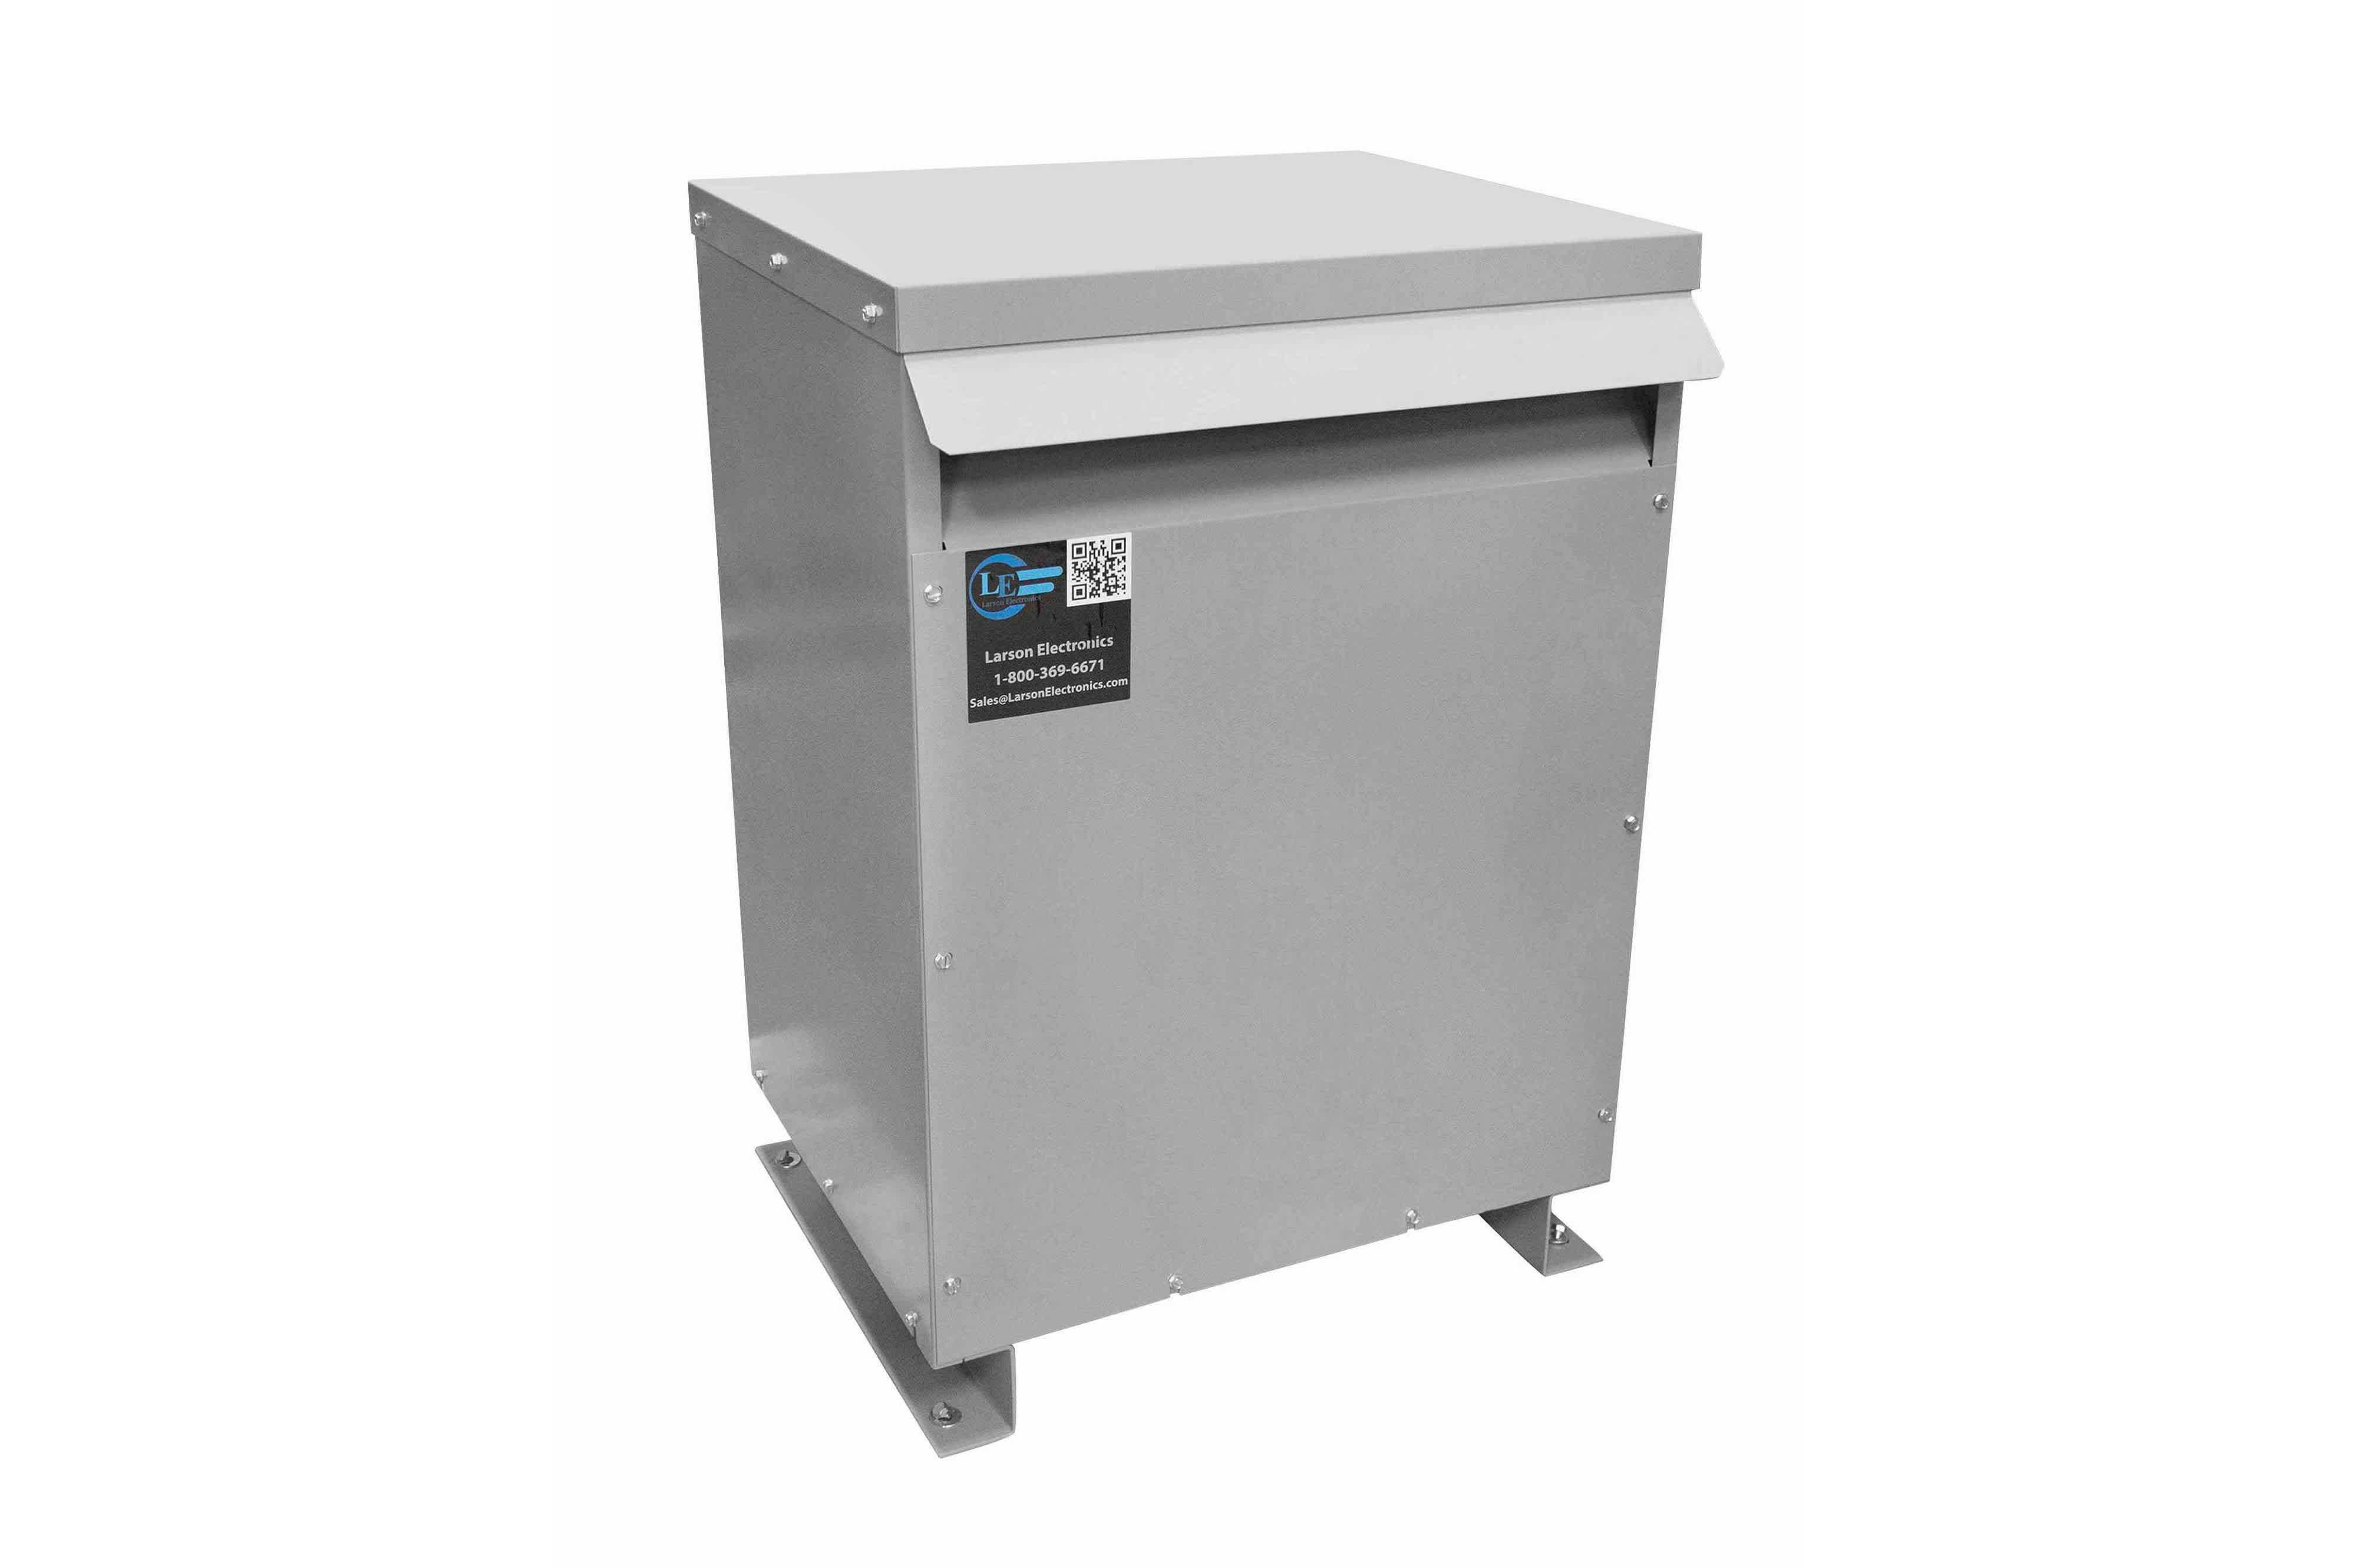 300 kVA 3PH Isolation Transformer, 415V Wye Primary, 600V Delta Secondary, N3R, Ventilated, 60 Hz